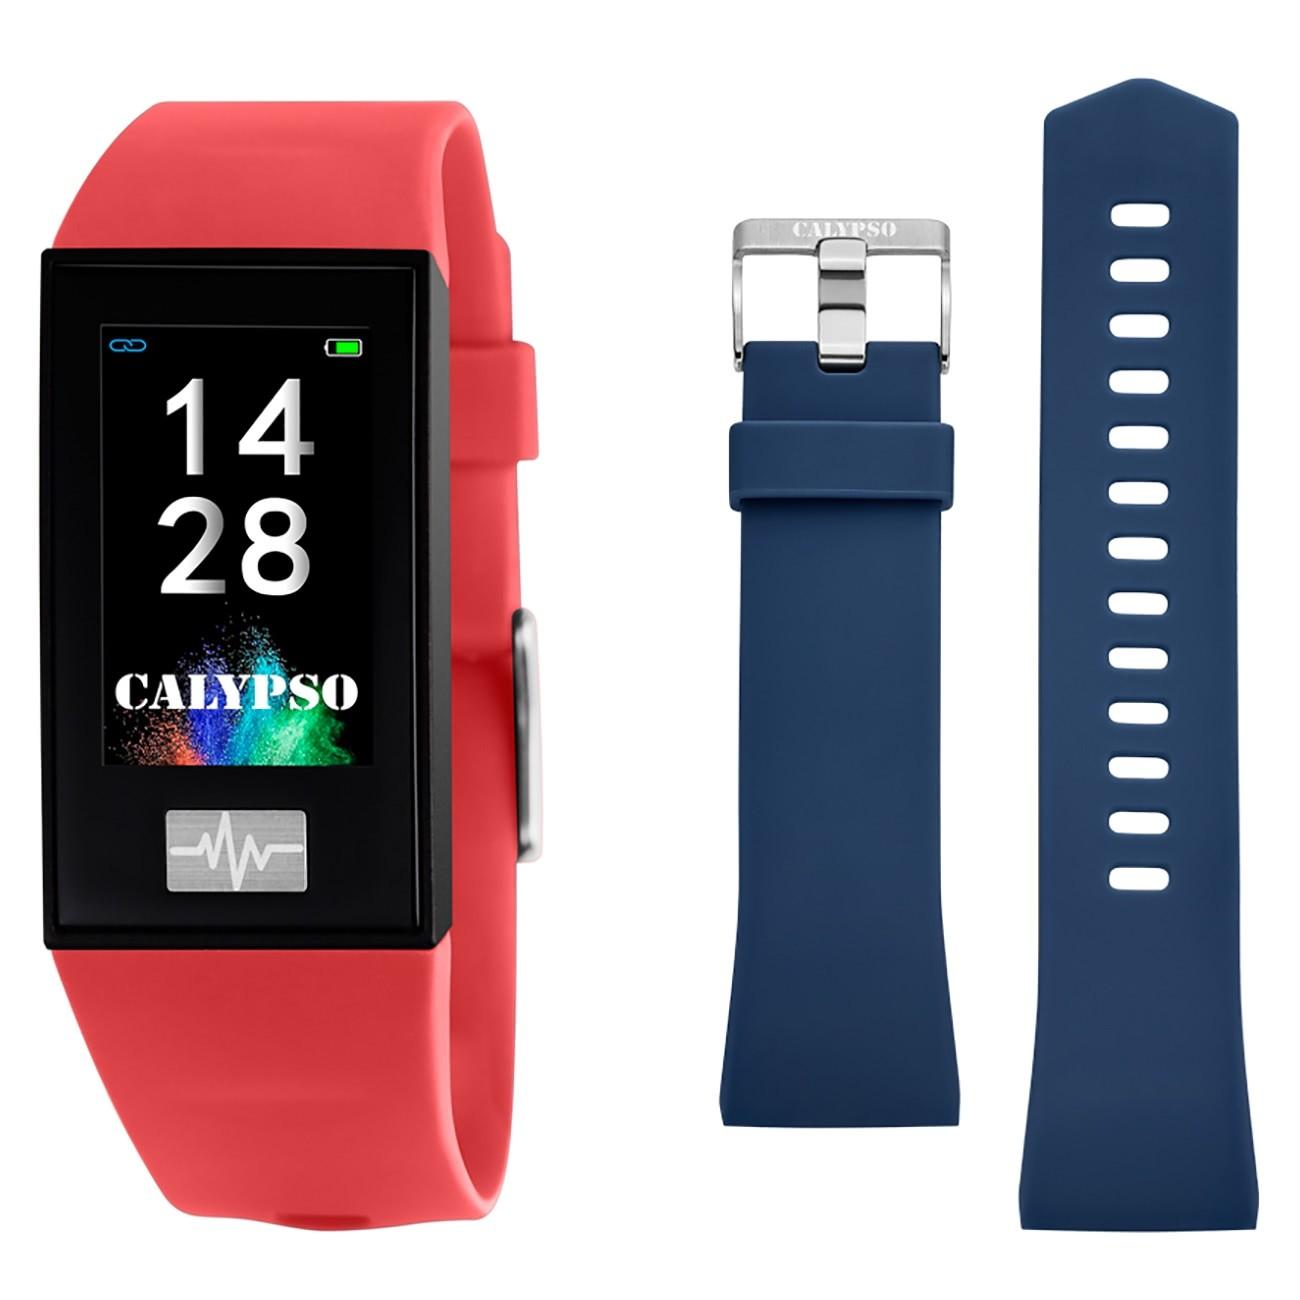 Calypso Fitness Tracker Smartime K8500-4 Smartwatch rot, blau TCK8500-4